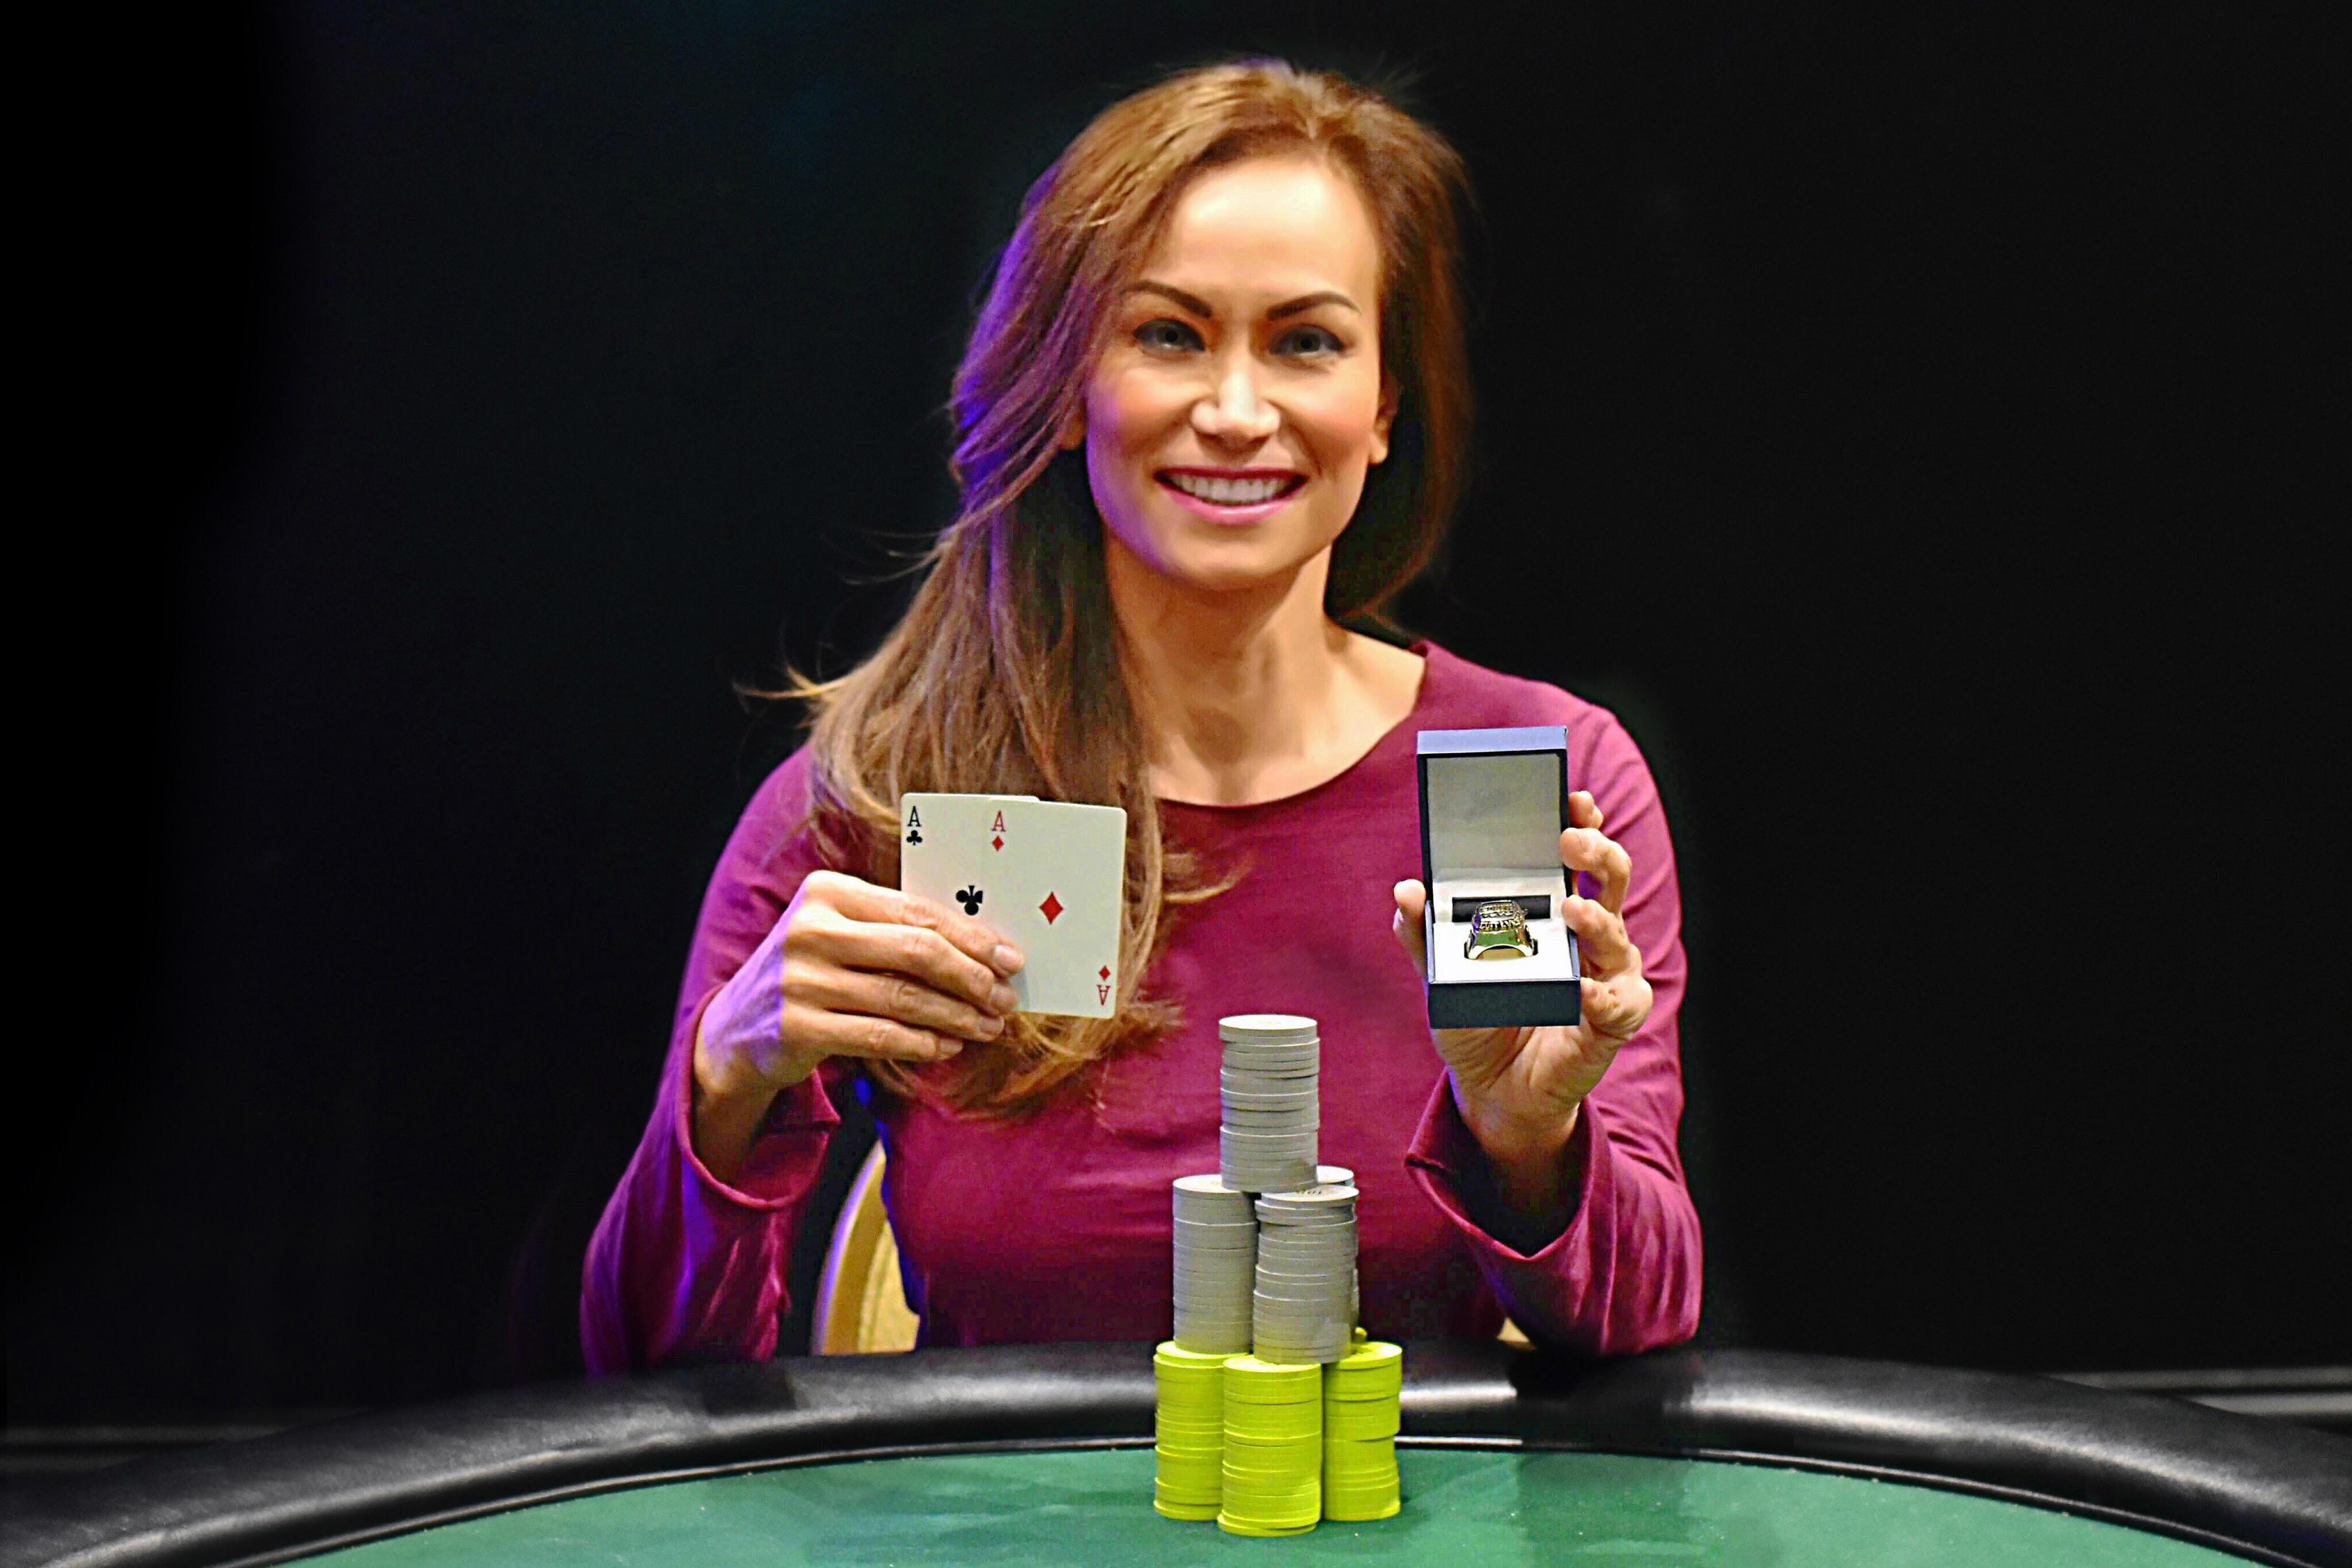 Poker tournament online results